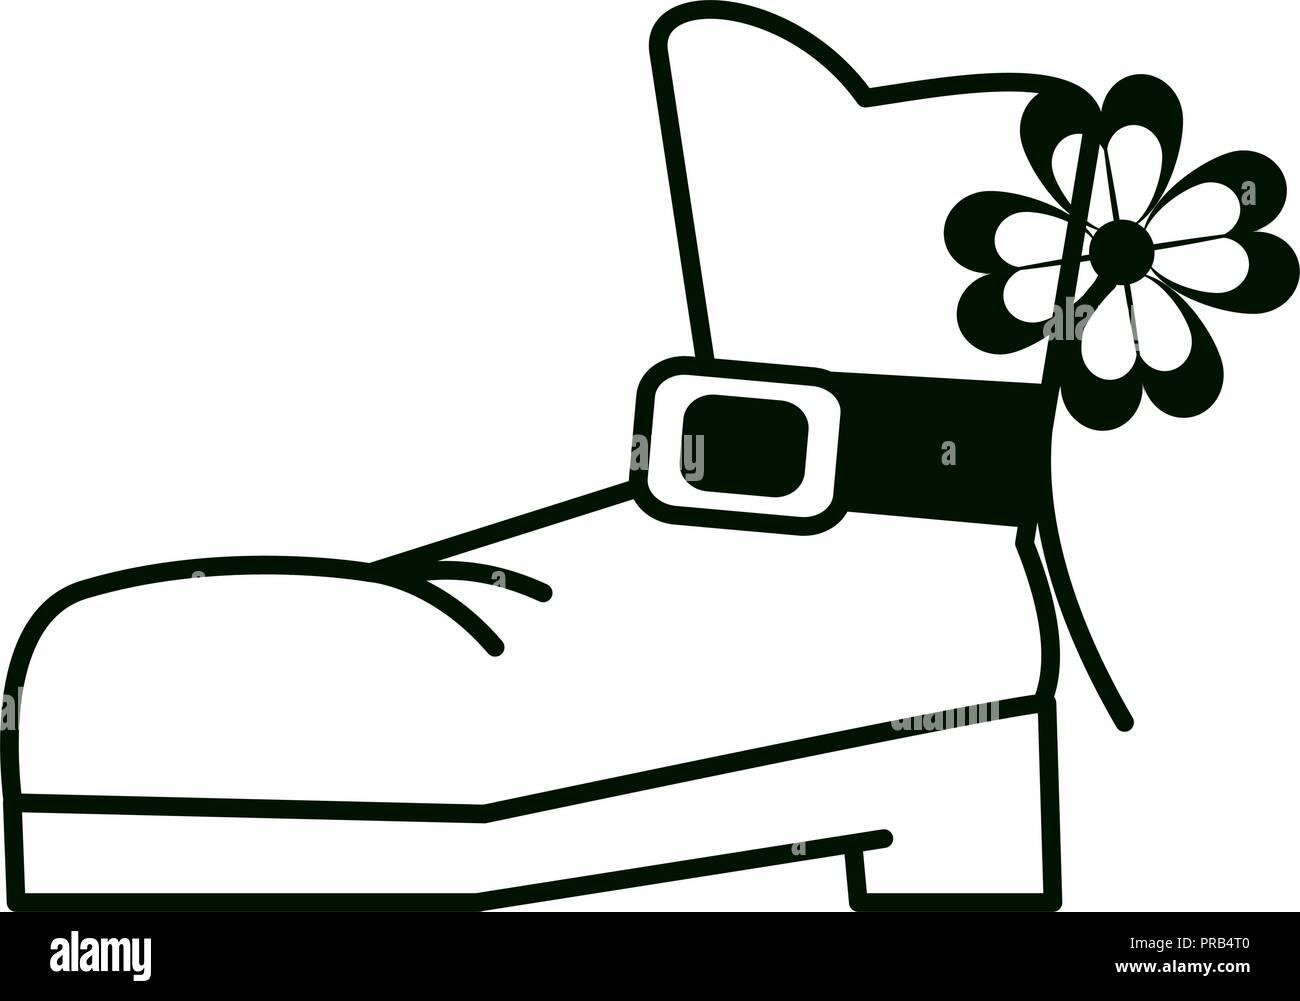 Elf boot isolated - Stock Image